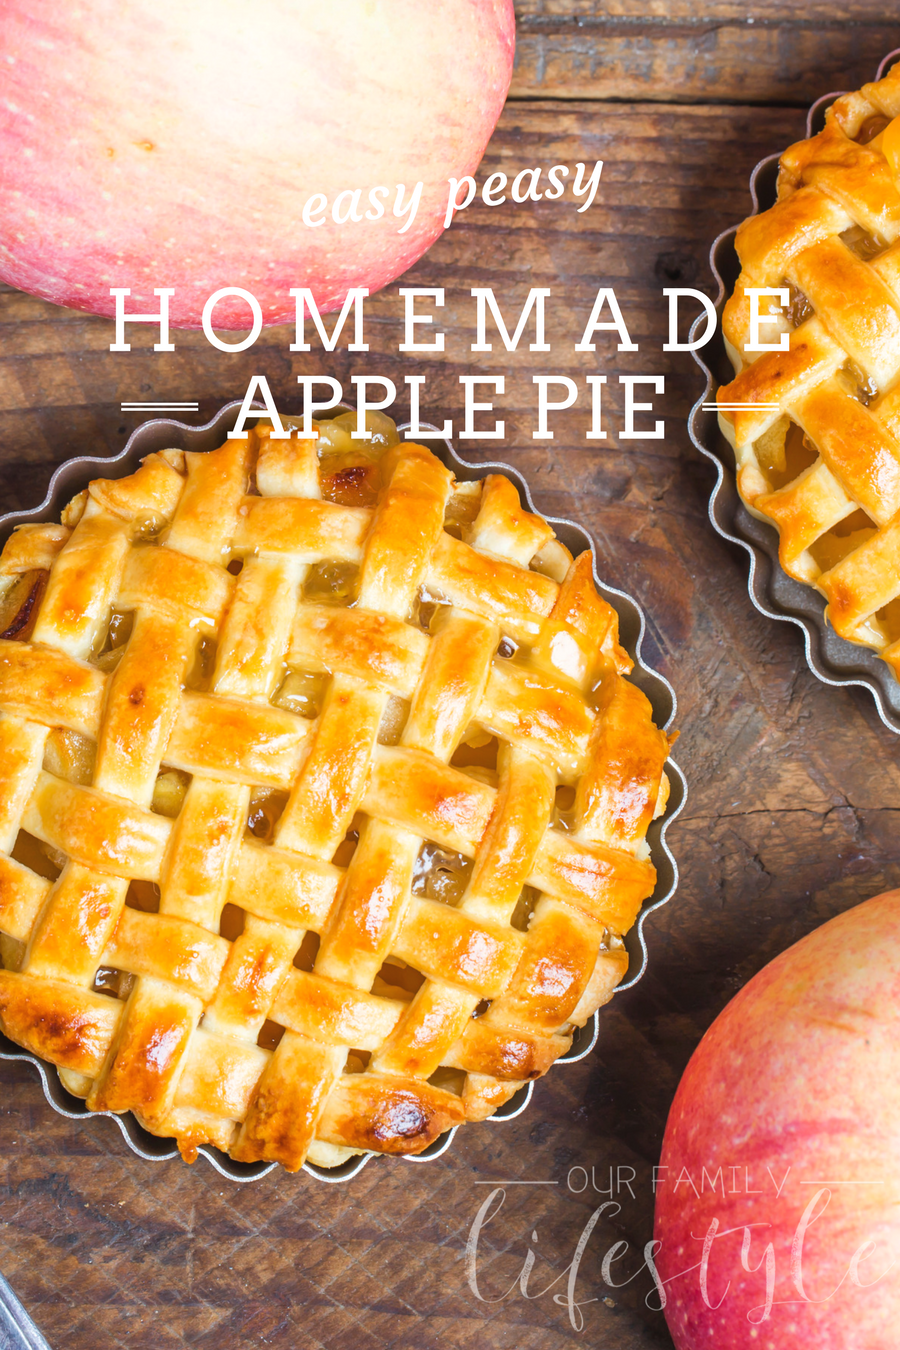 easy peasy homemade apple pie